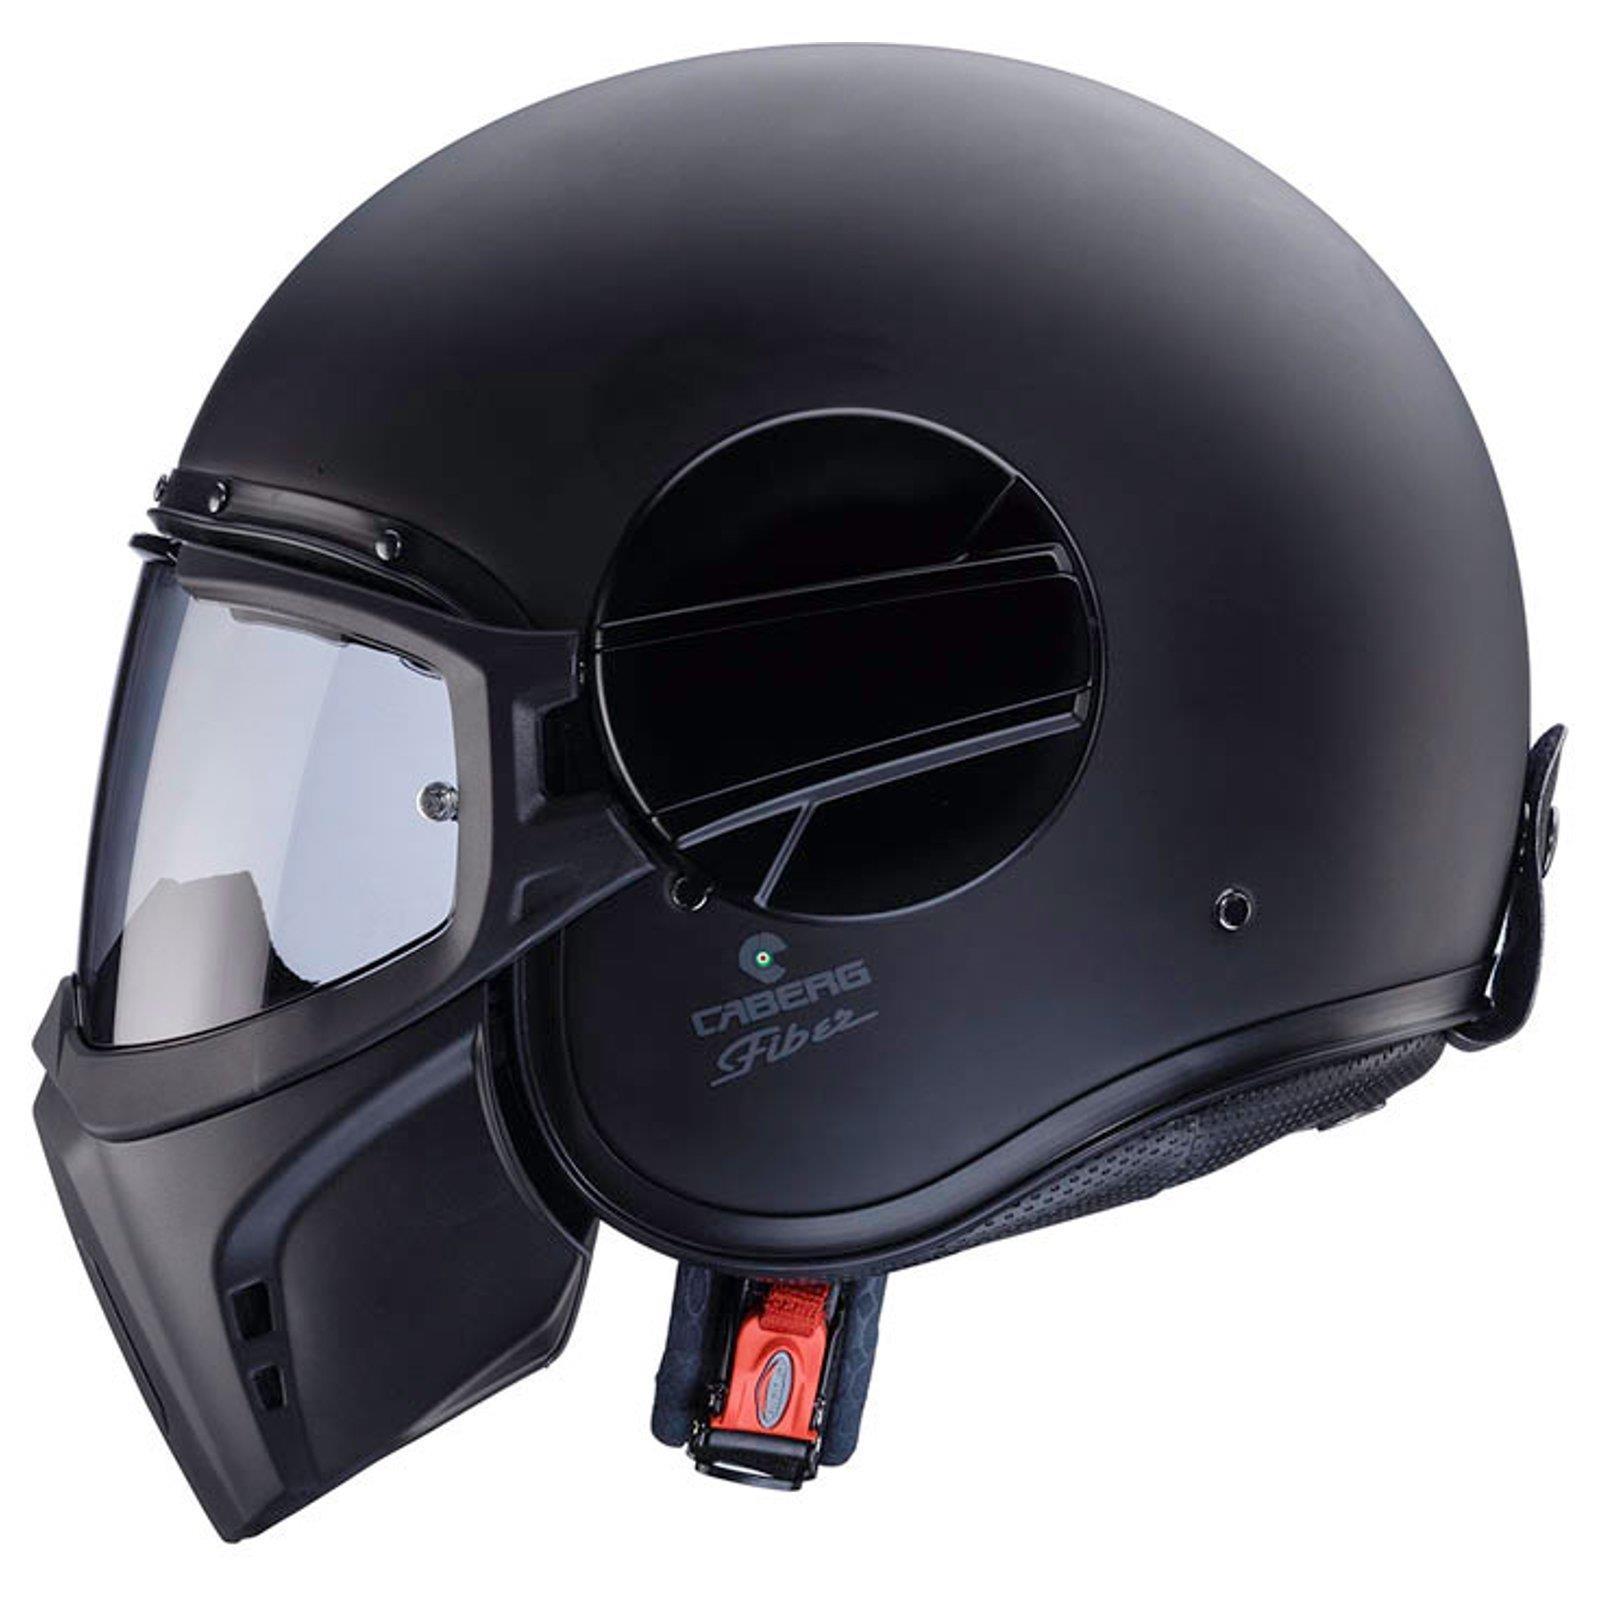 caberg ghost motorrad jet helm matt schwarz pinlock visier. Black Bedroom Furniture Sets. Home Design Ideas